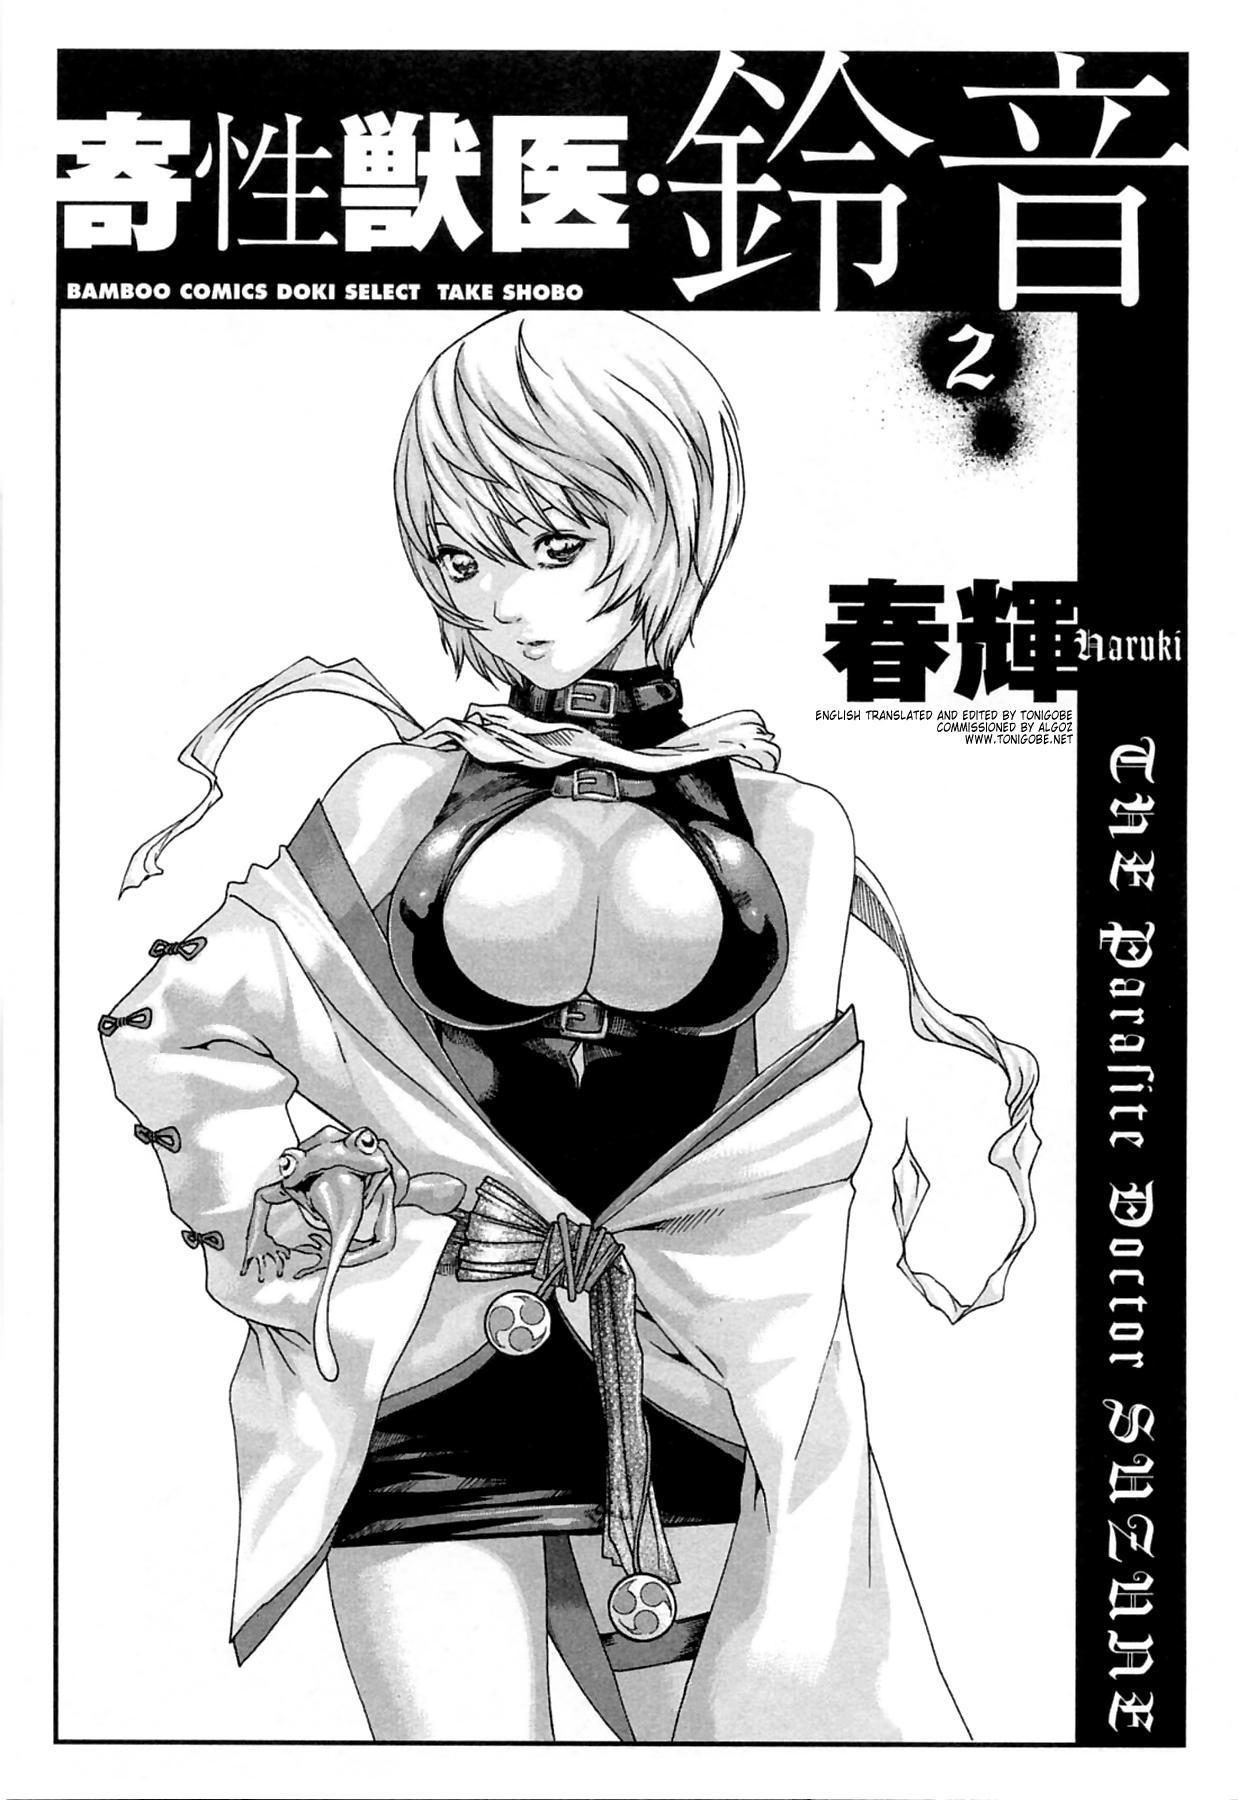 [Haruki] Kisei Juui Suzune (Parasite Doctor Suzune) Vol.02 - CH10-11 3